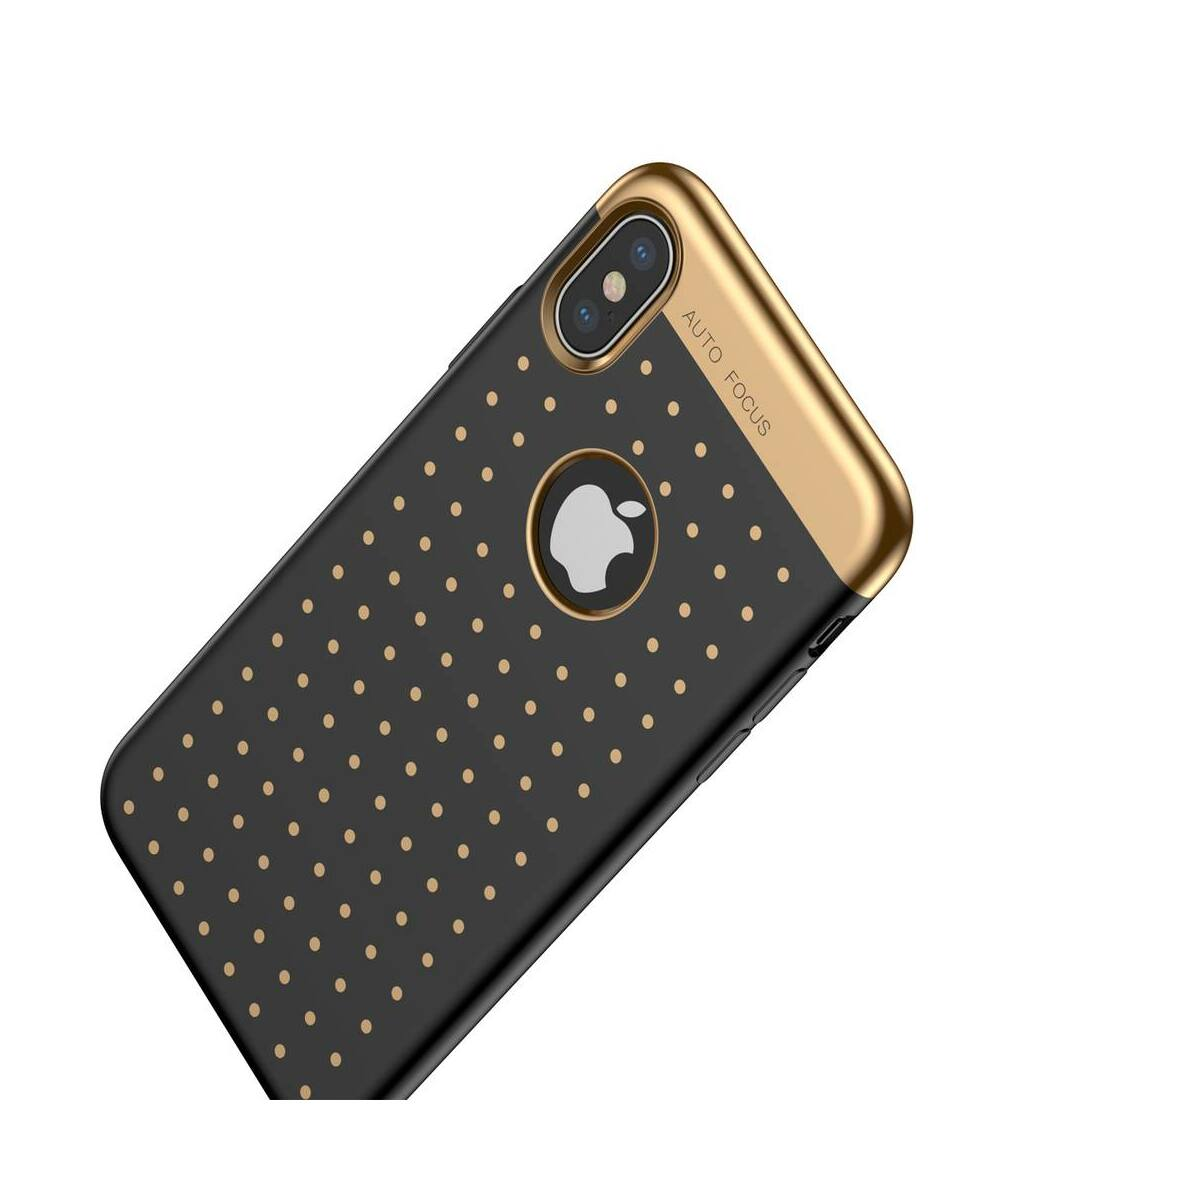 Baseus iPhone X/XS tok, Star lighting, fekete (WIAPIPHX-ST01)